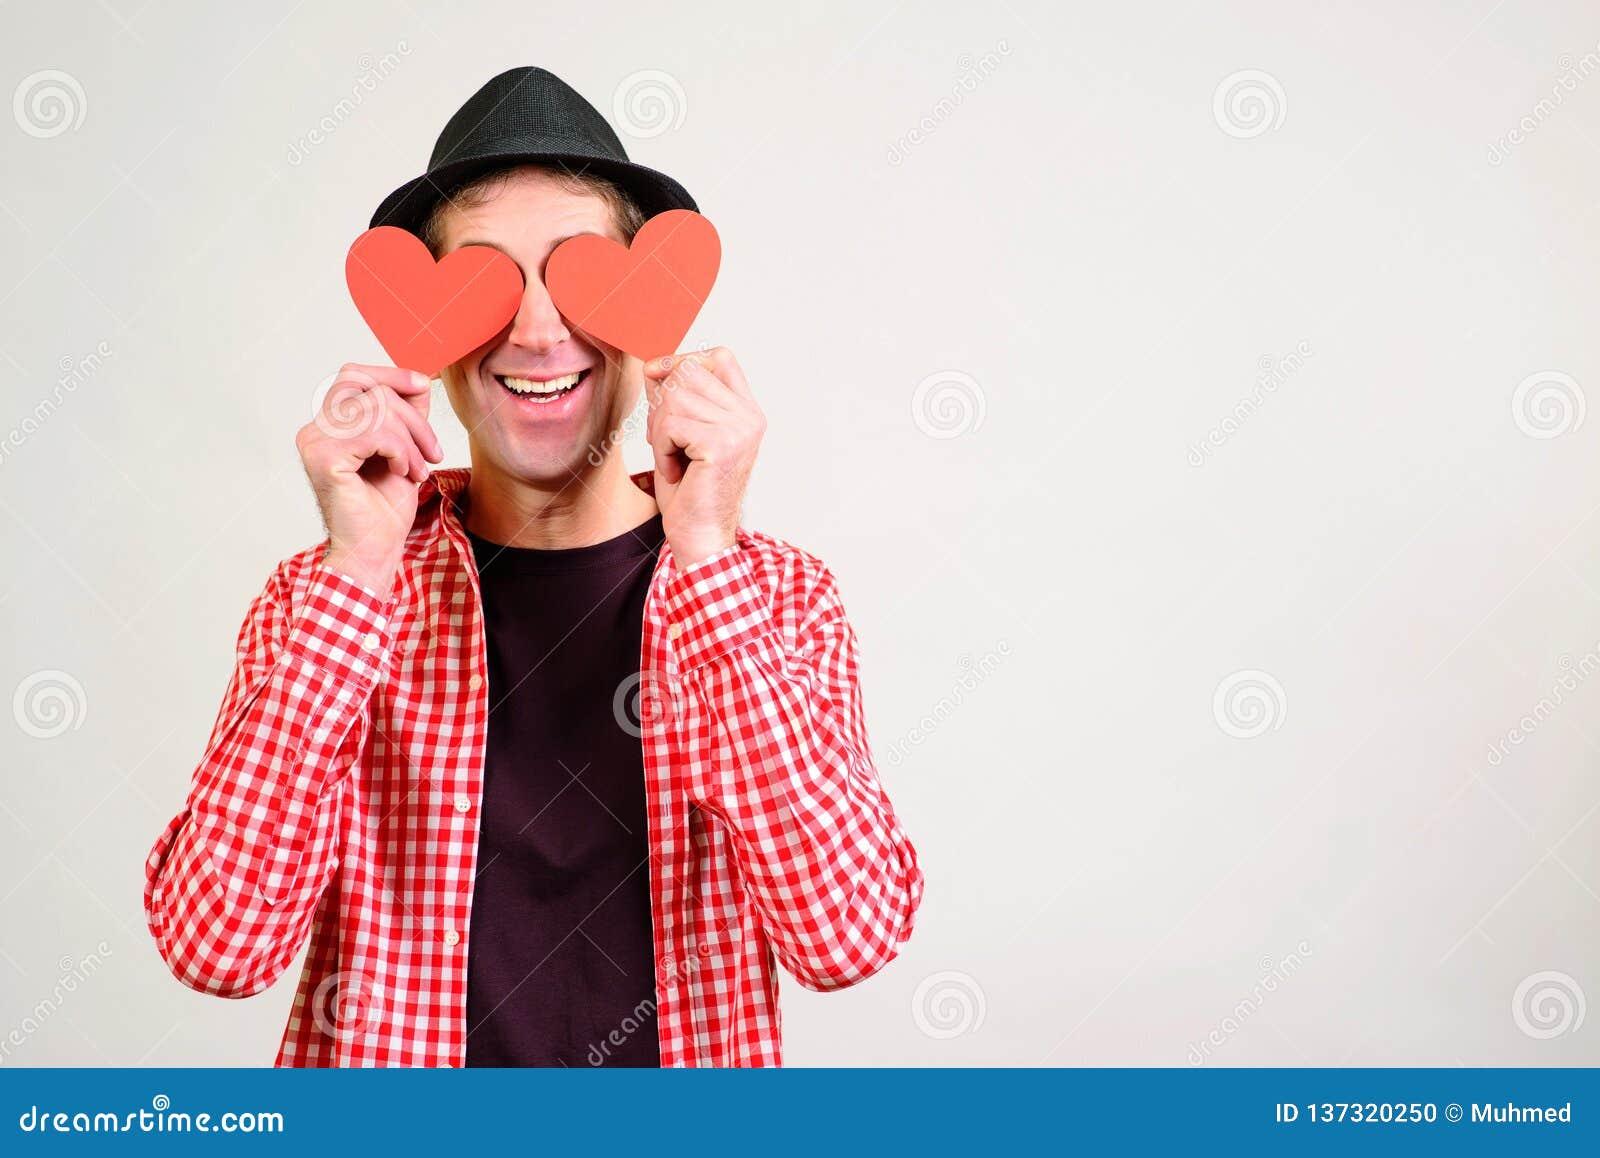 Romantic Guy Holds Valentine Cards  Be My Valentine